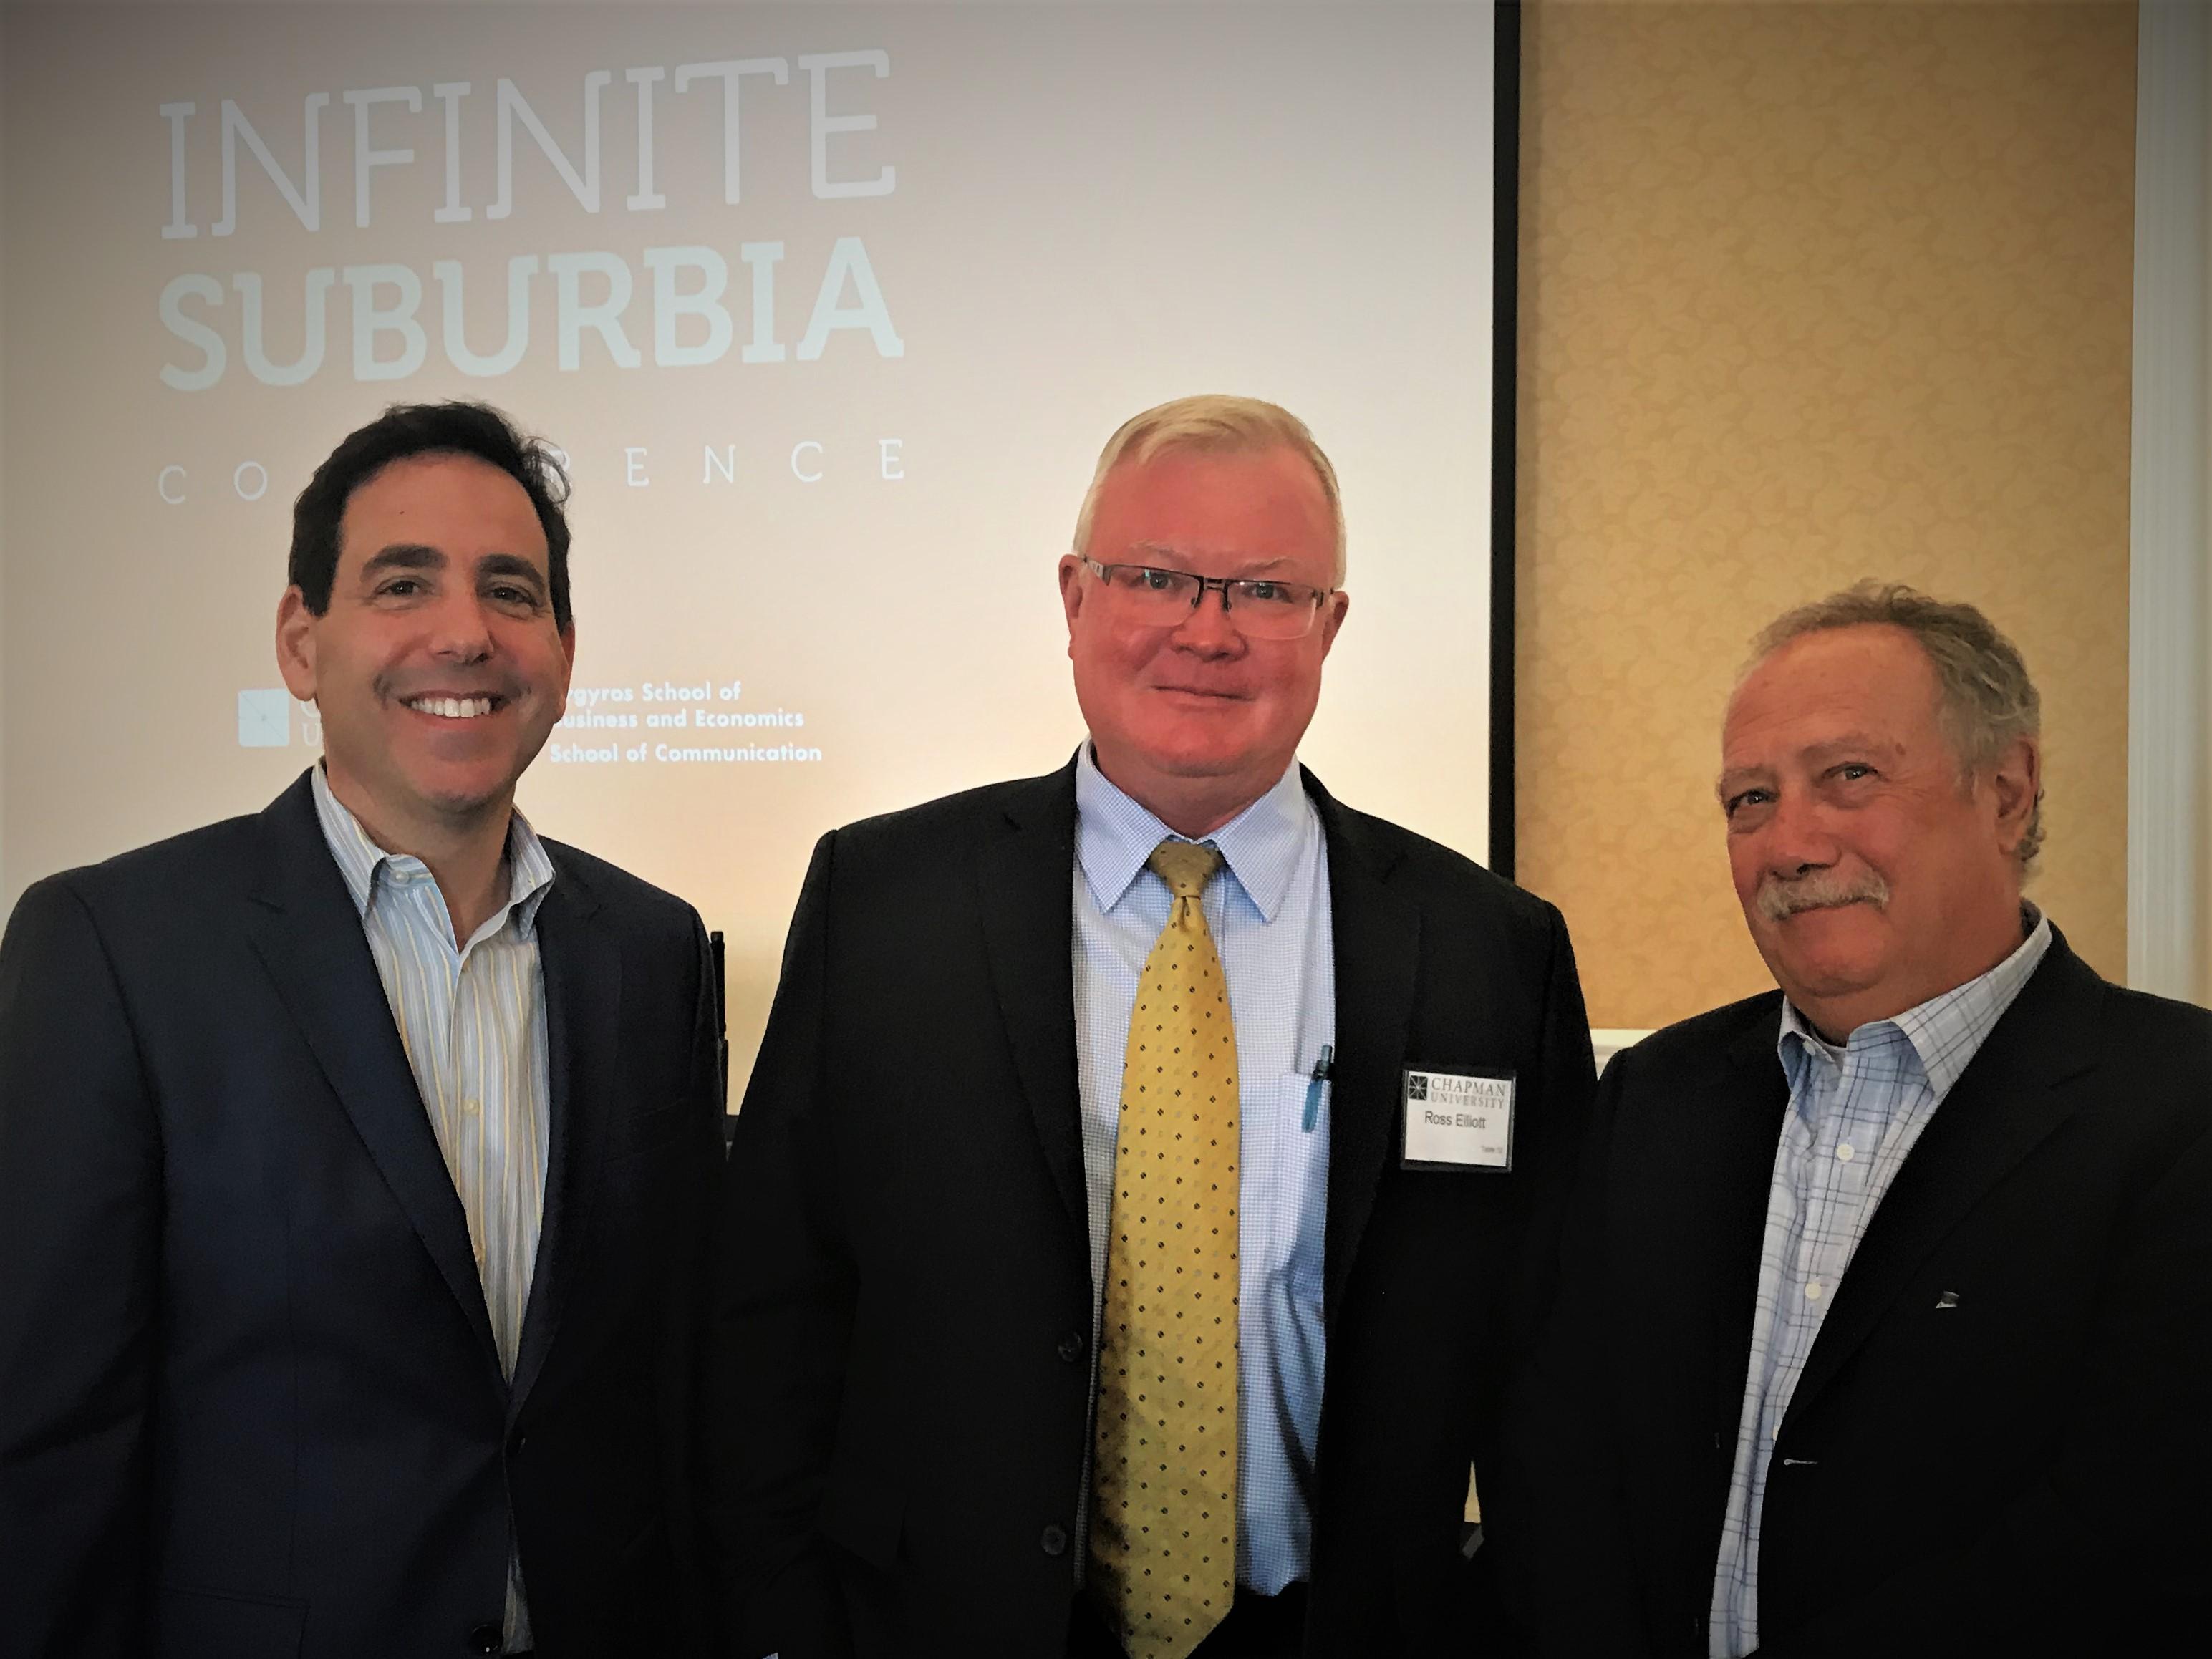 Featured left to right: Alan M. Berger, Ross Elliot, Joel Kotkin